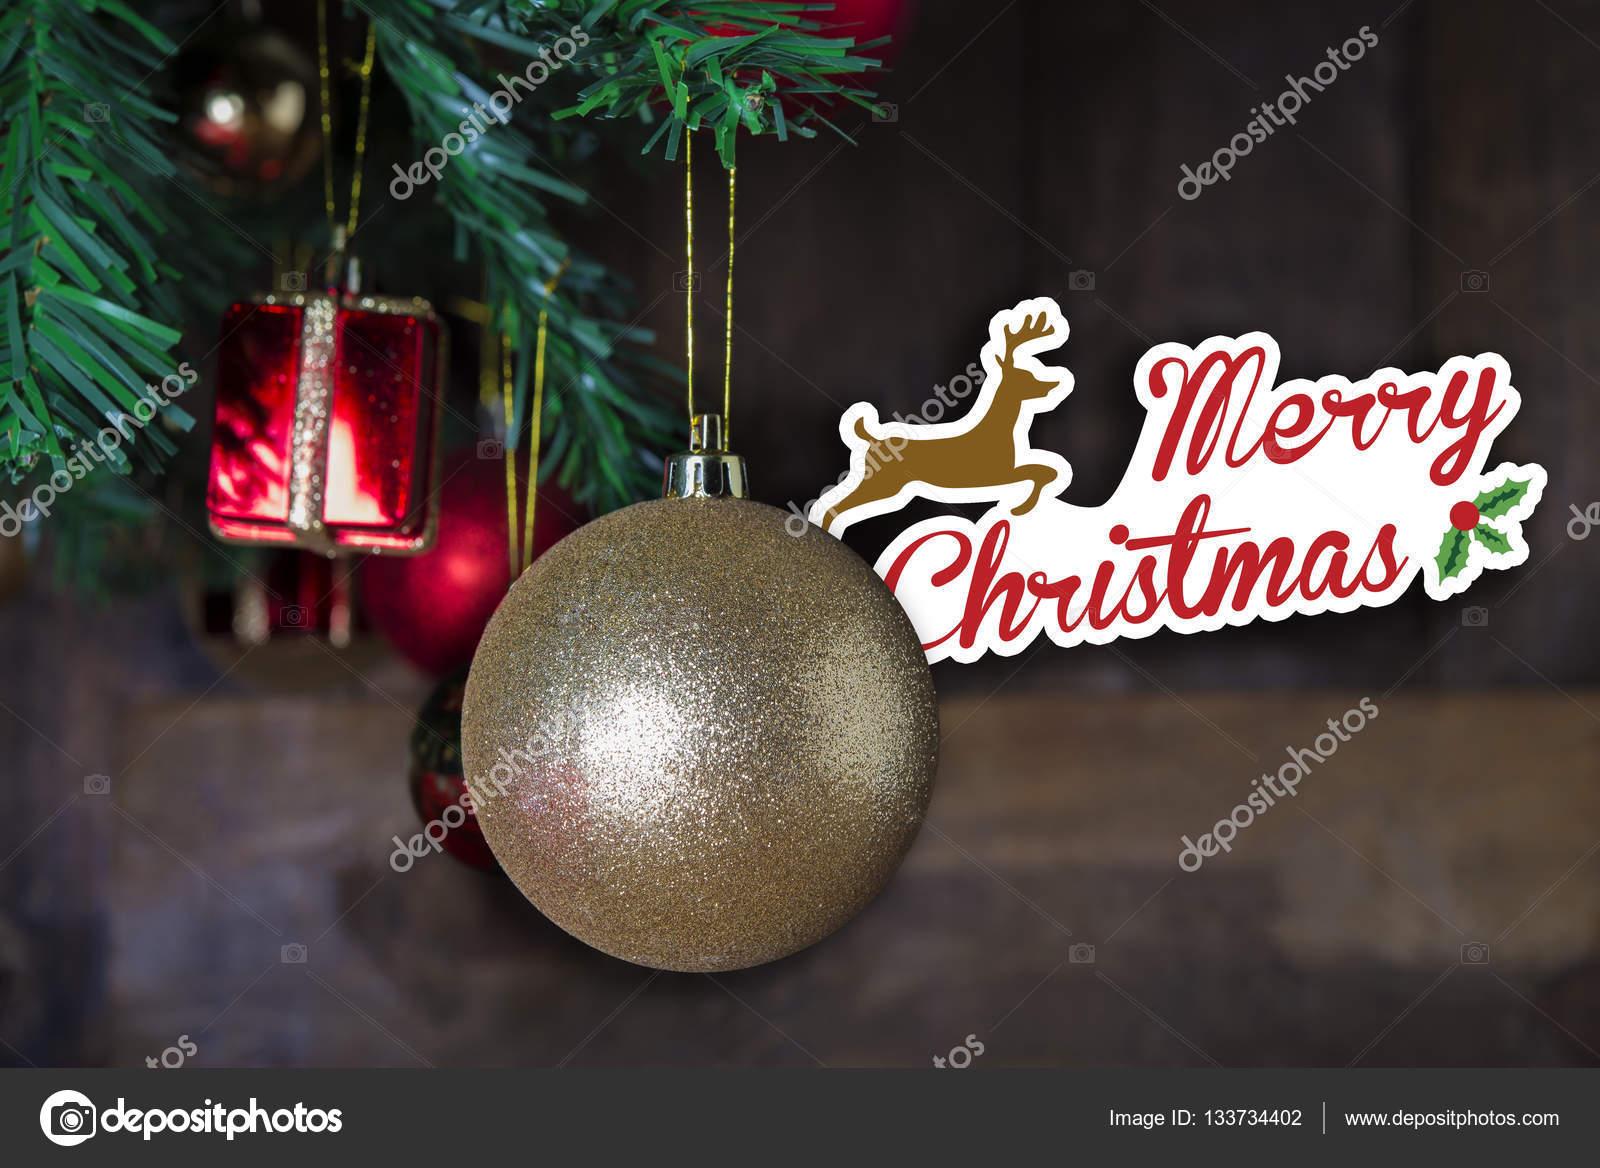 Christmas Greeting Postcard With Template Merry Christmas Stock